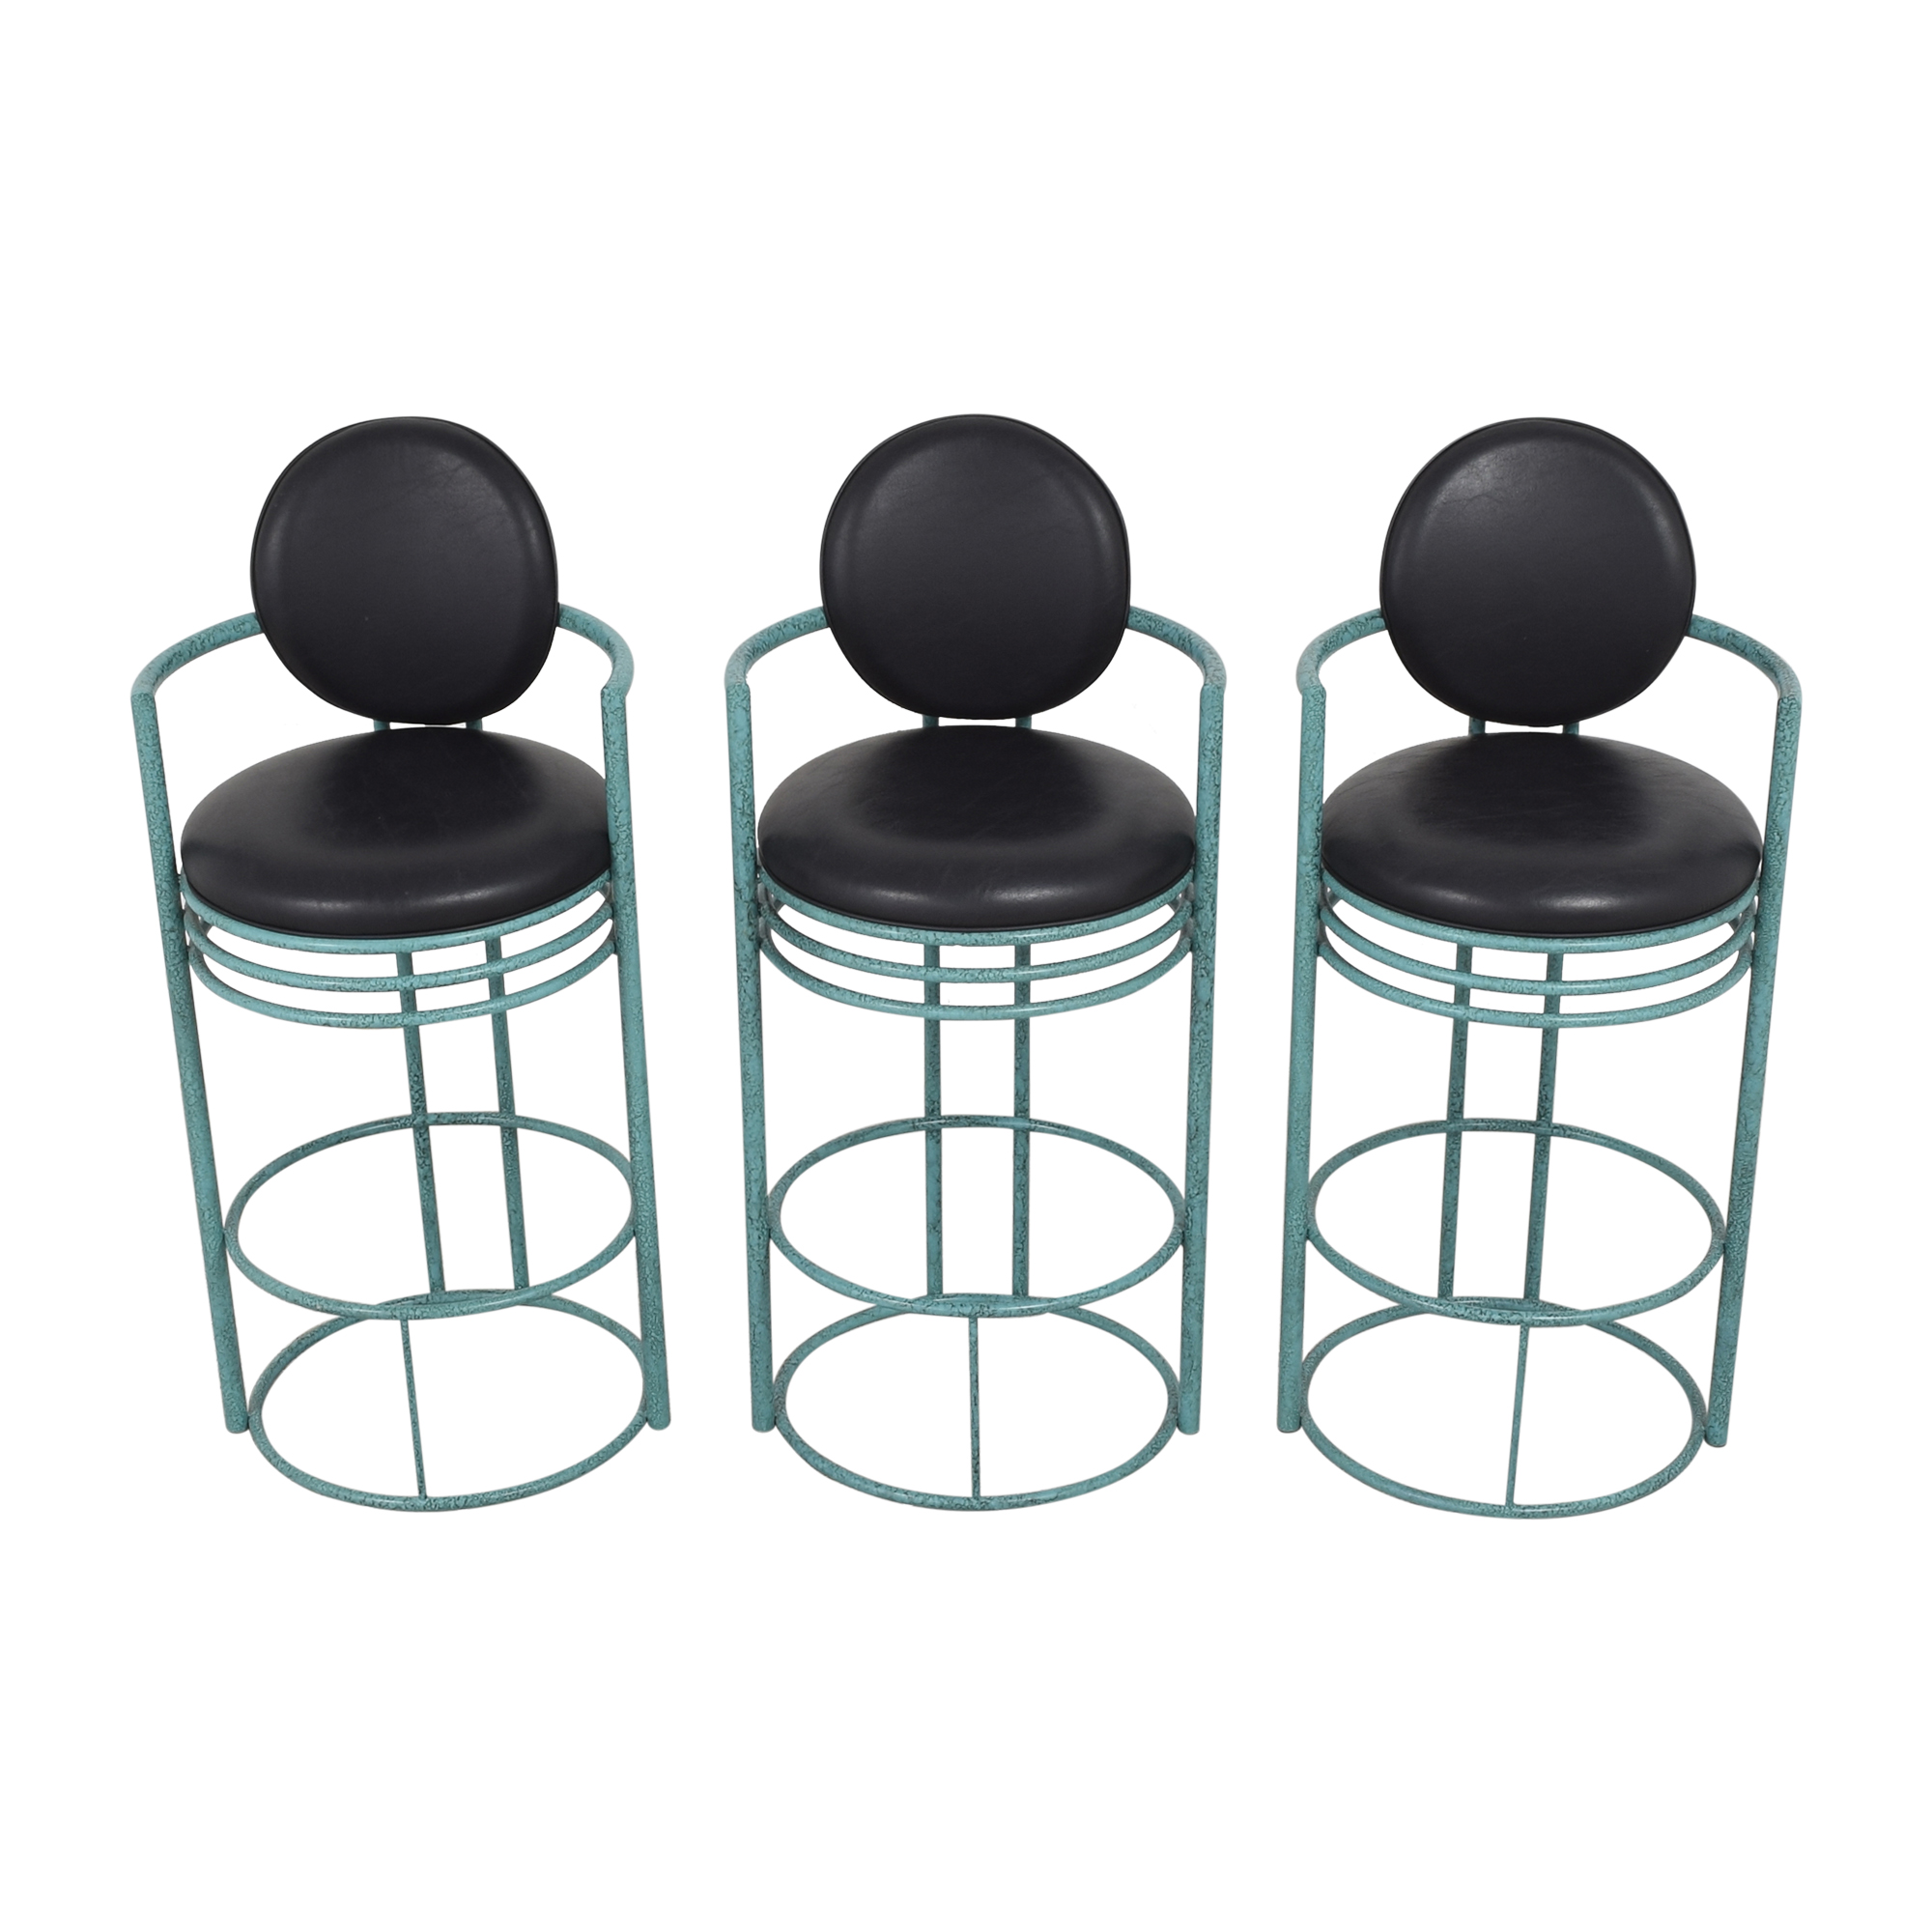 Design Institute America Bar Stools / Dining Chairs